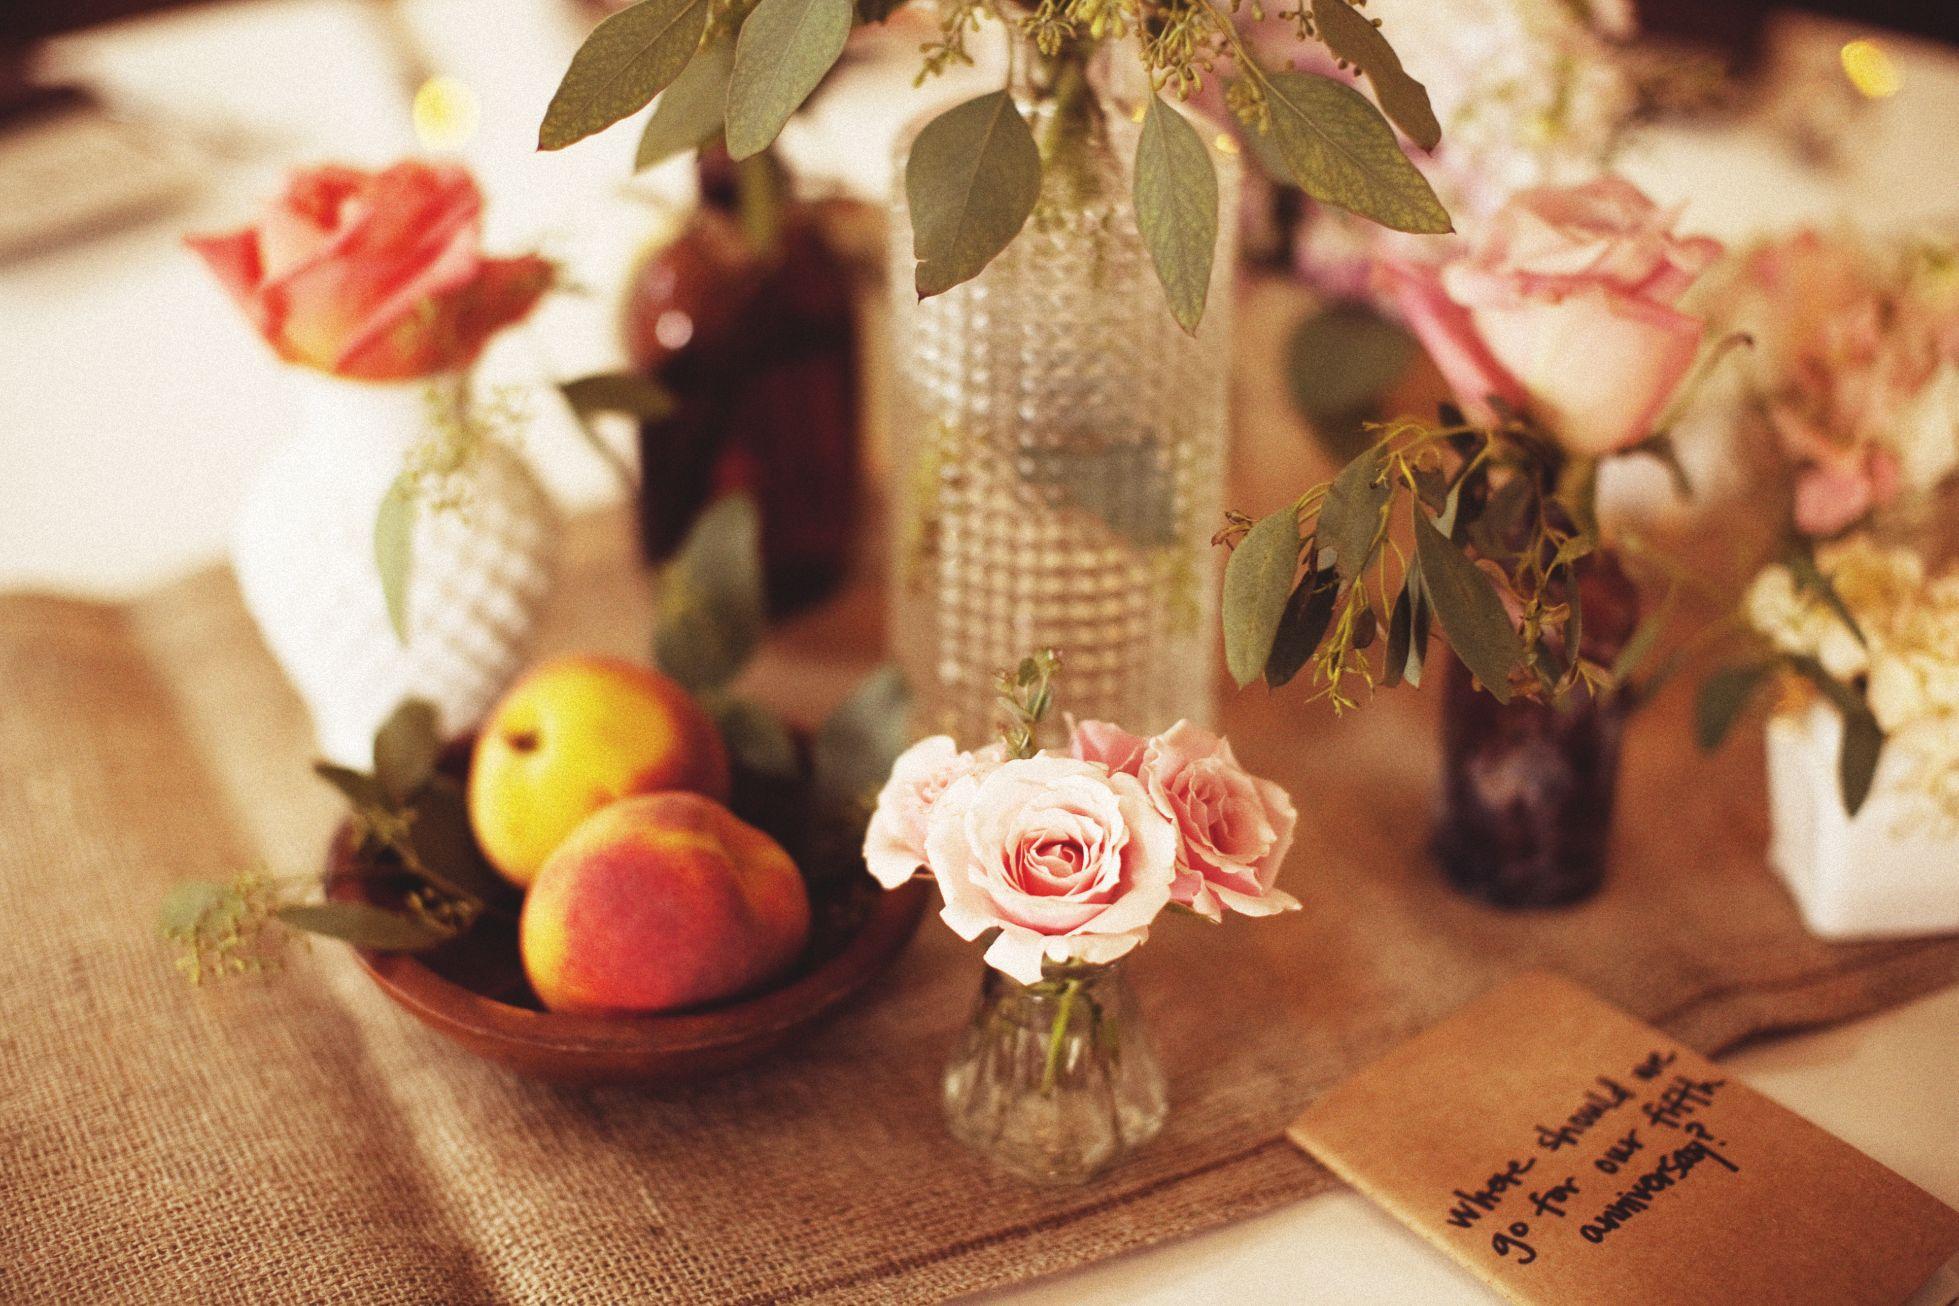 ee.paige.alex.stephen.wedding-113.jpg